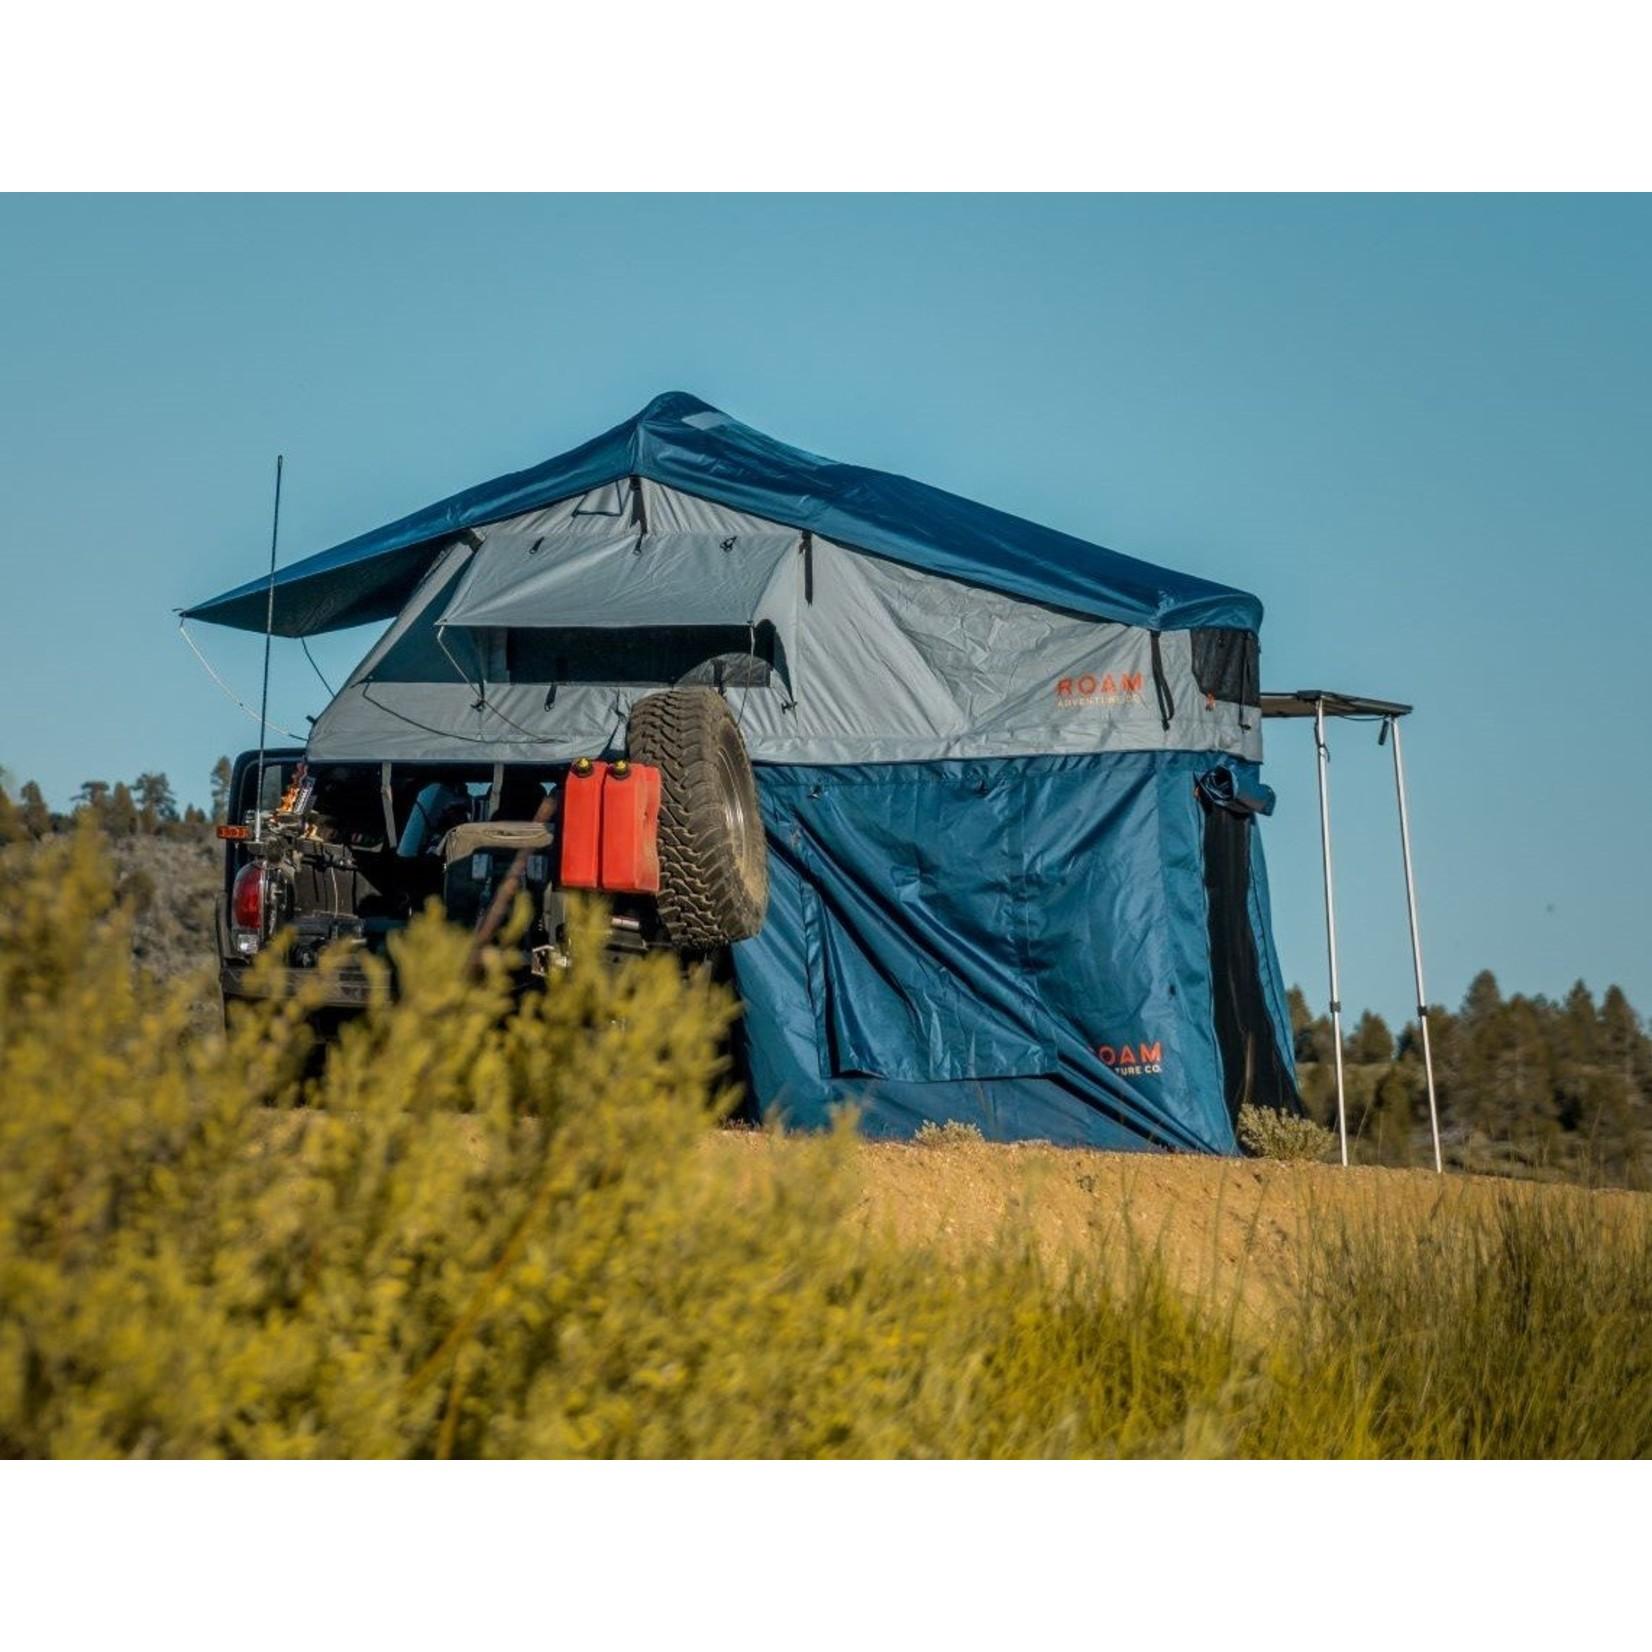 Roam Roam Vagabond Roof Top Tent